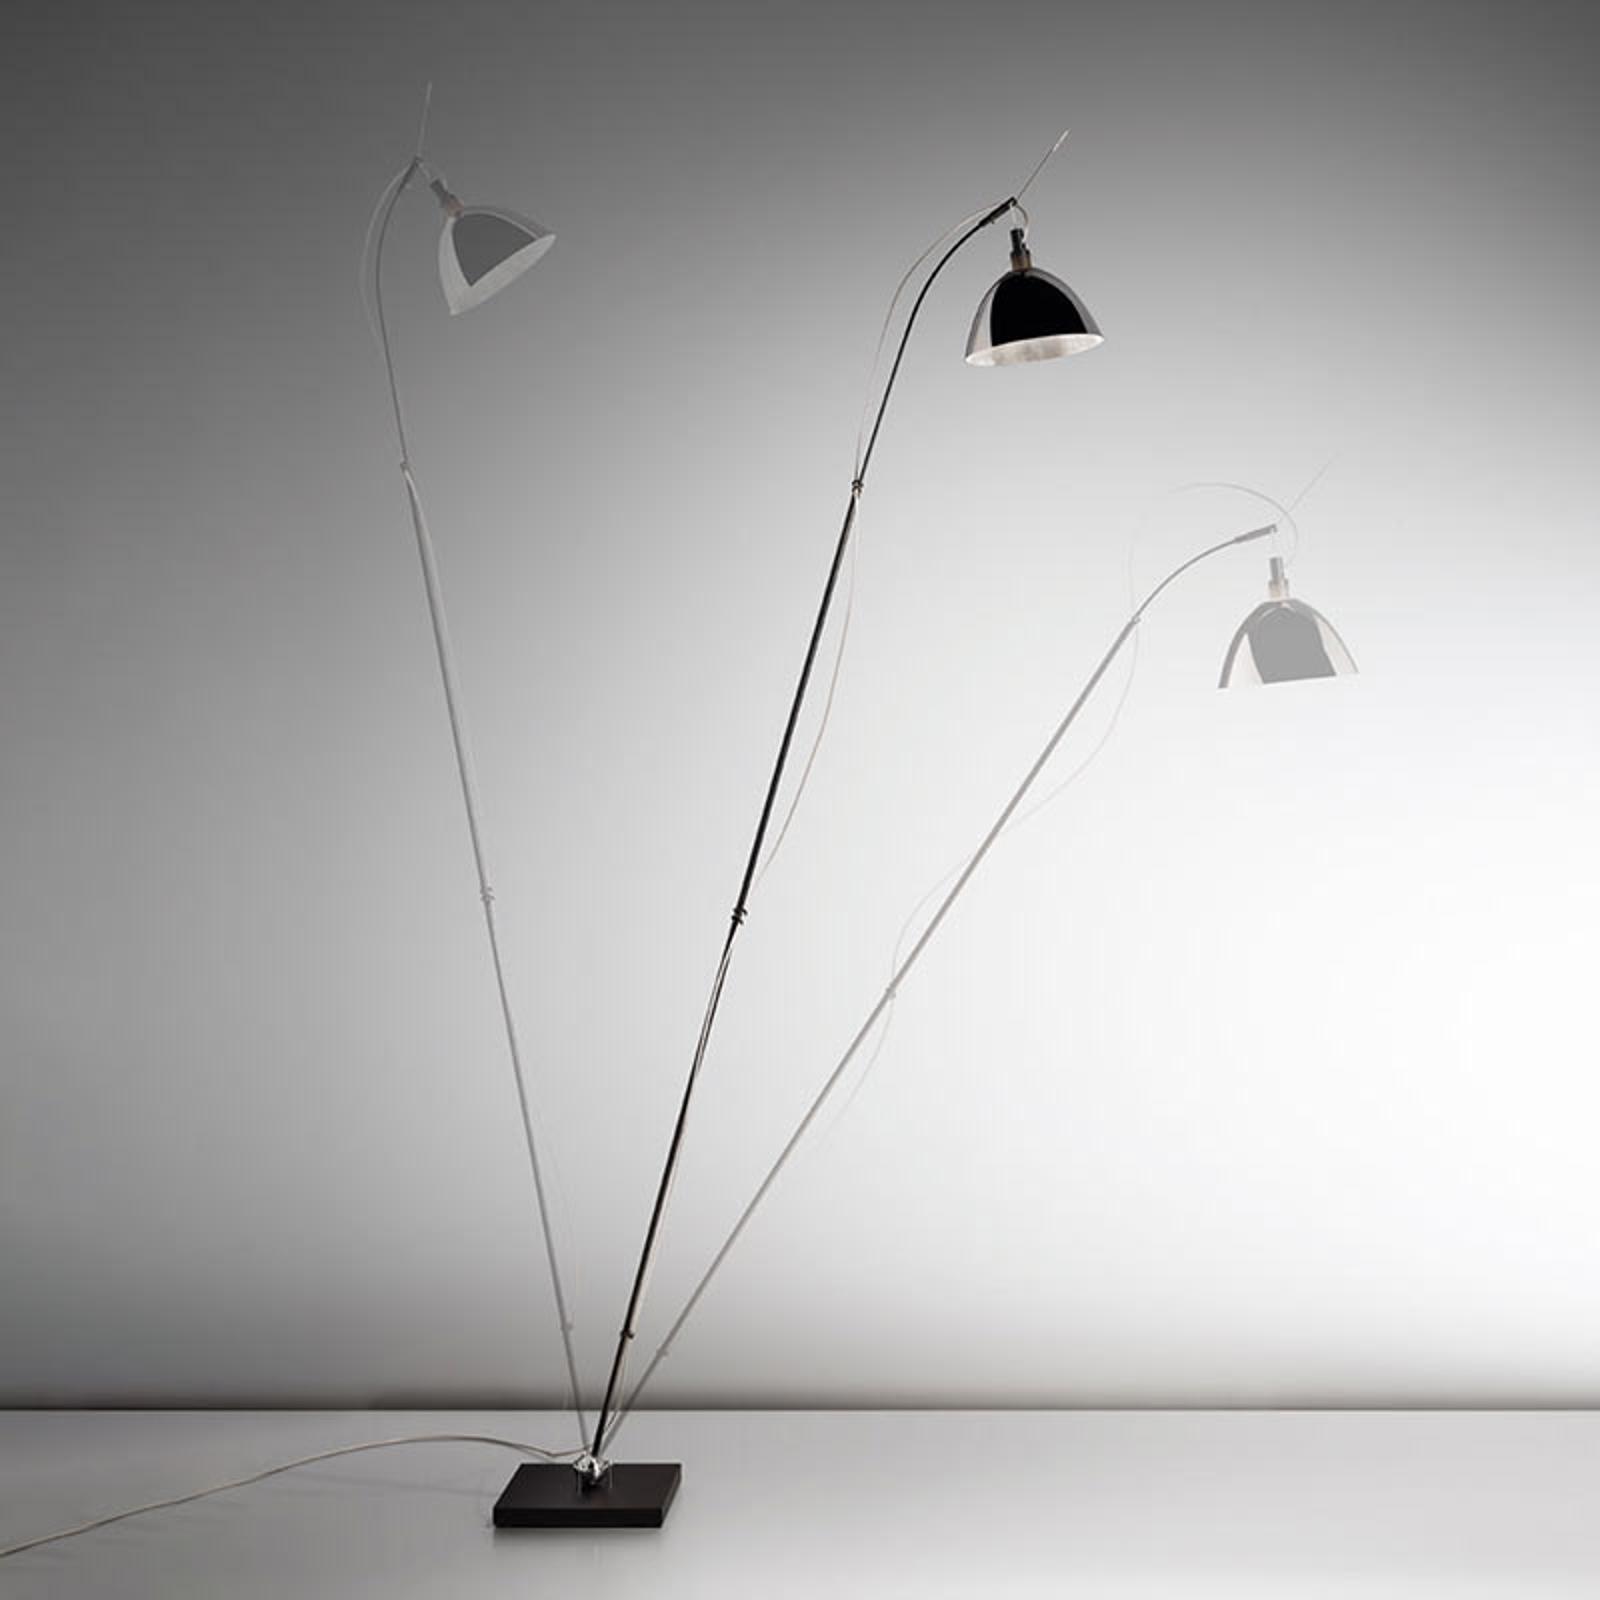 Produktové foto Ingo Maurer Ingo Maurer Max. Floor stojací lampa, hliník